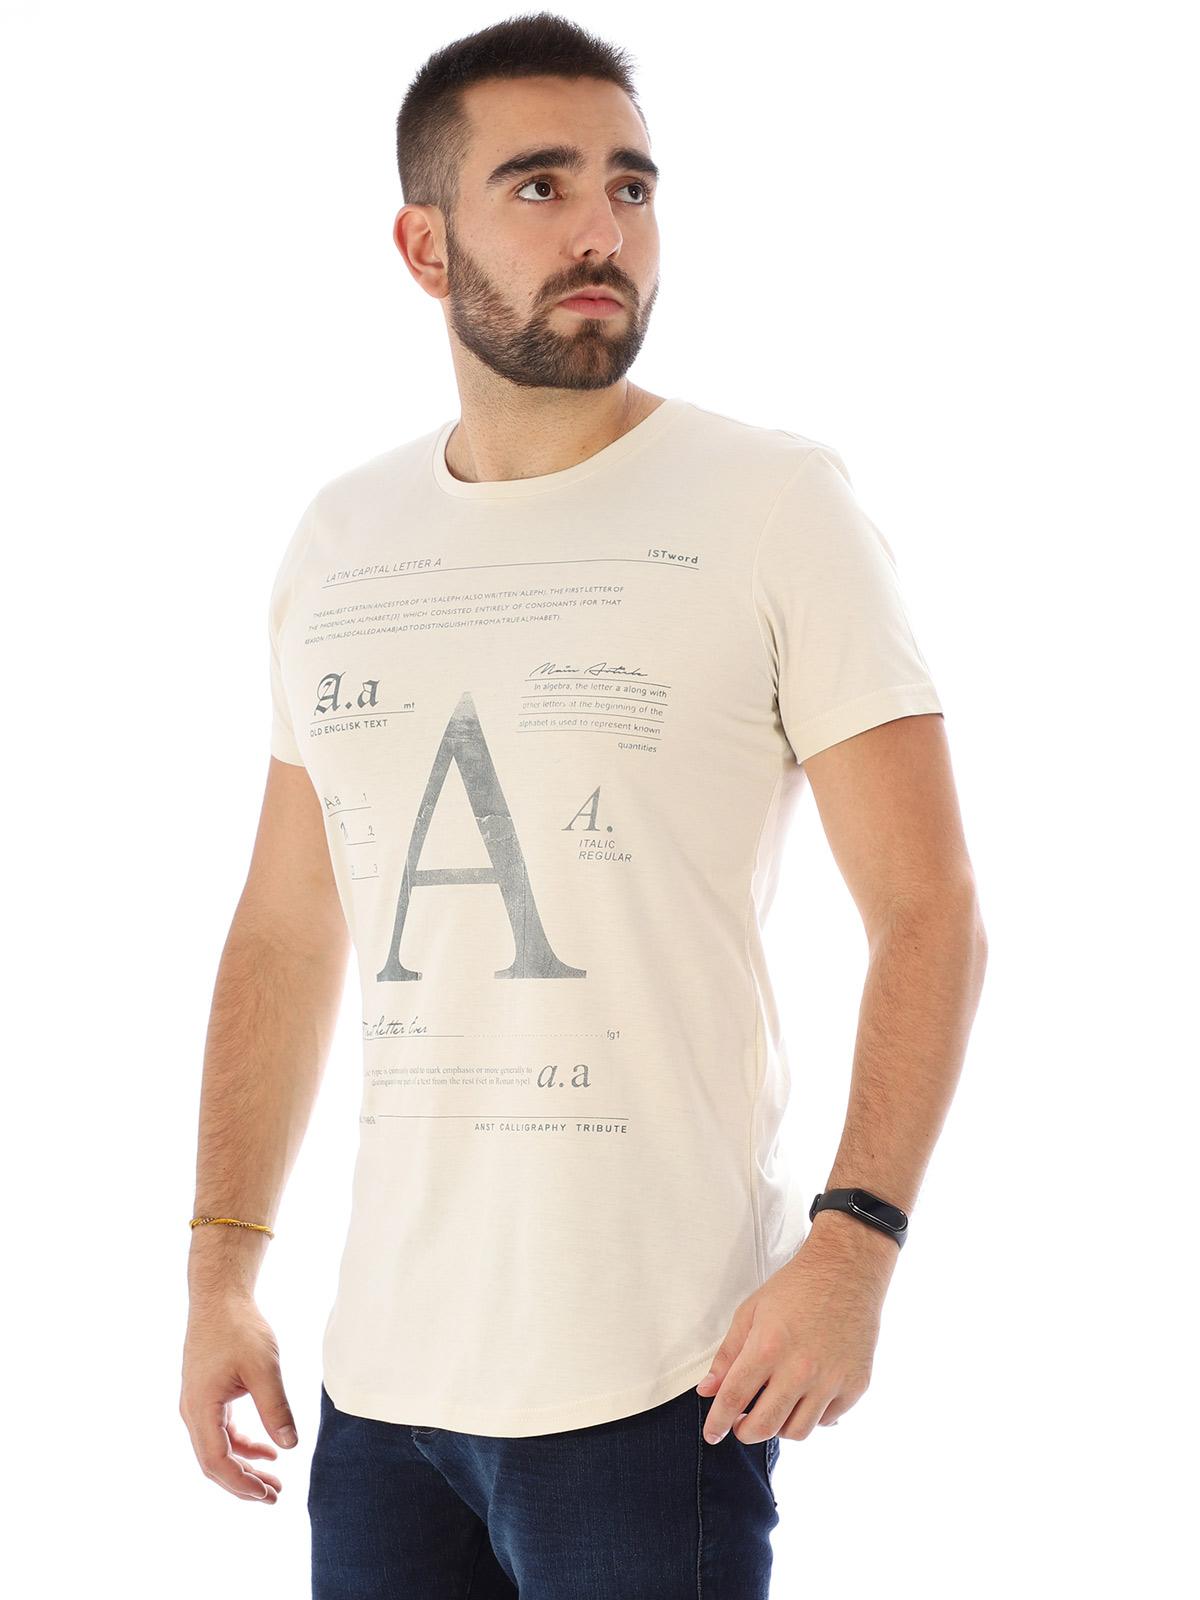 Camiseta Masculina Manga Curta Swag Slim Fit Brand Areia